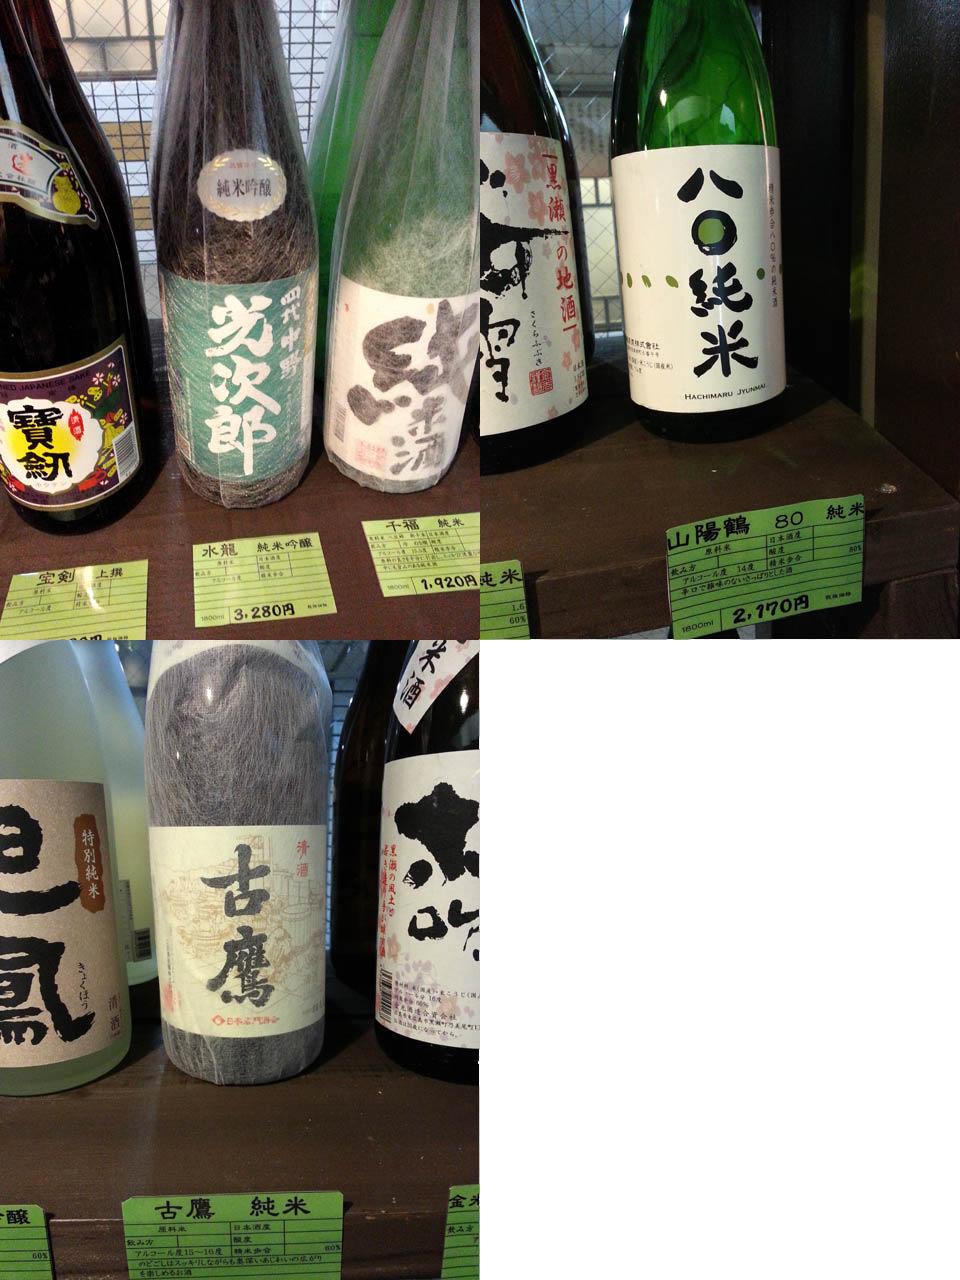 aonisai_013_new_0004.jpg